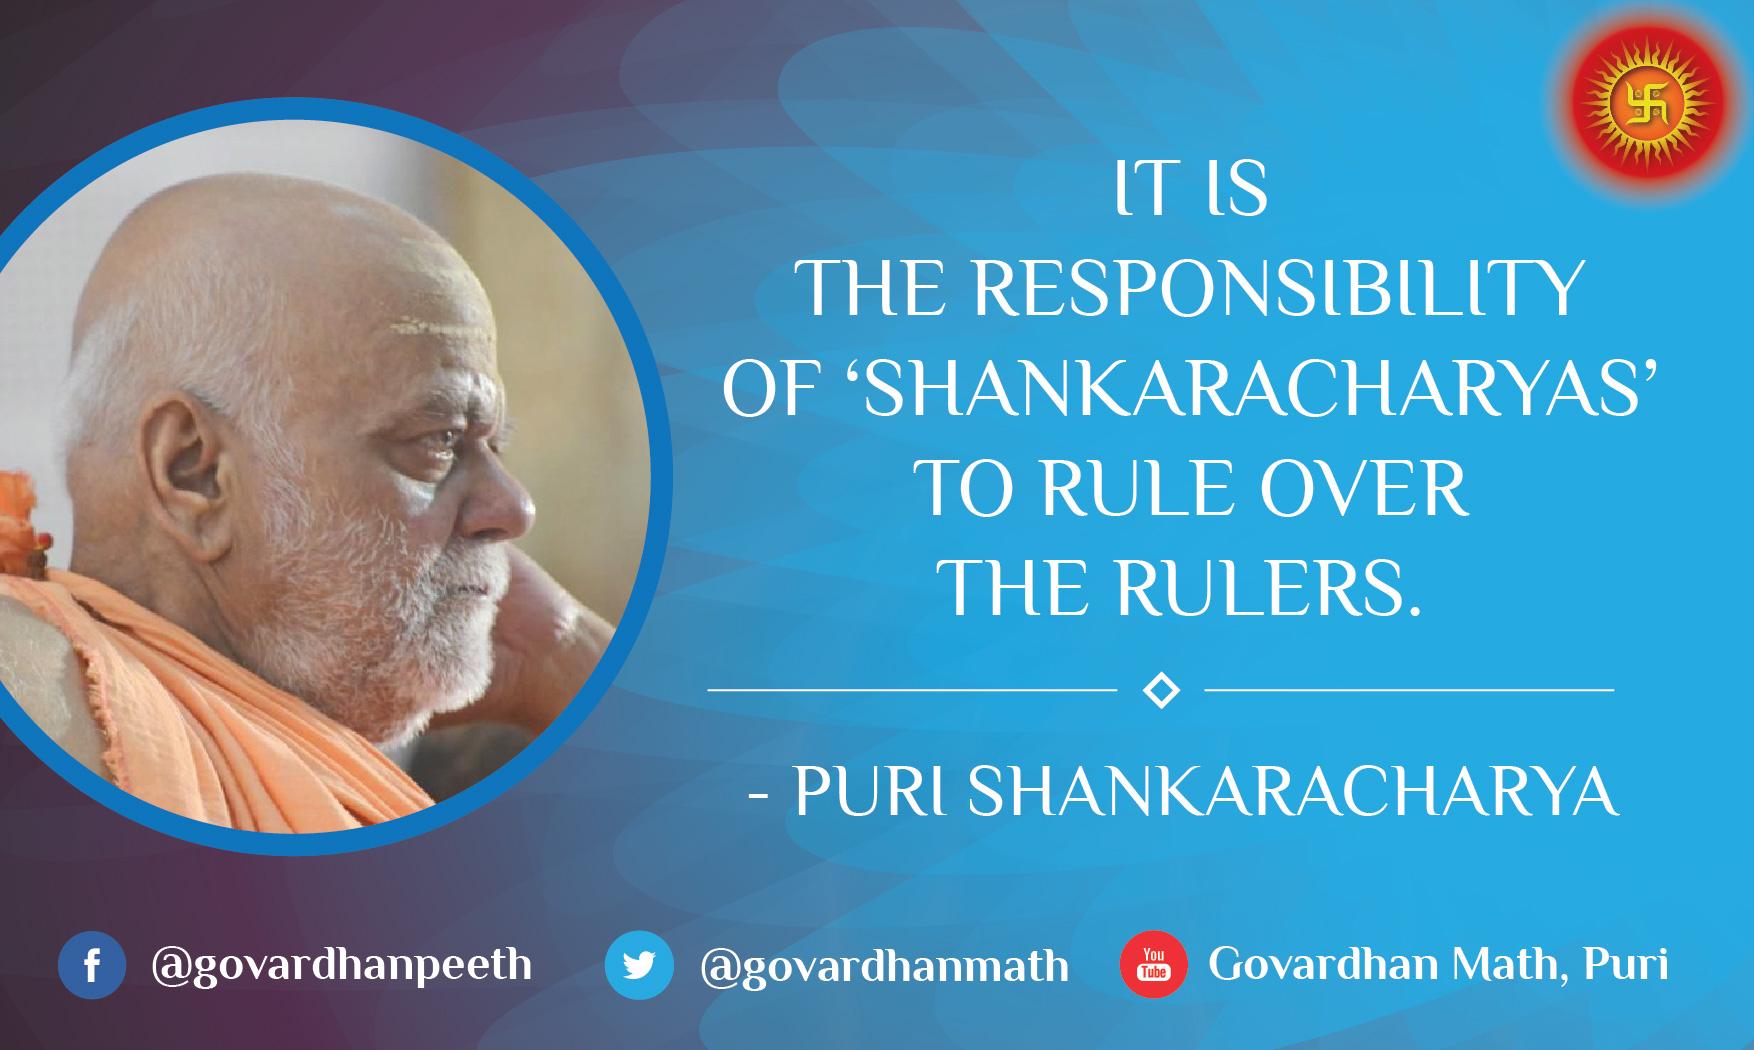 Ith Shiv Guru Ji Govrdhan — Minutemanhealthdirect